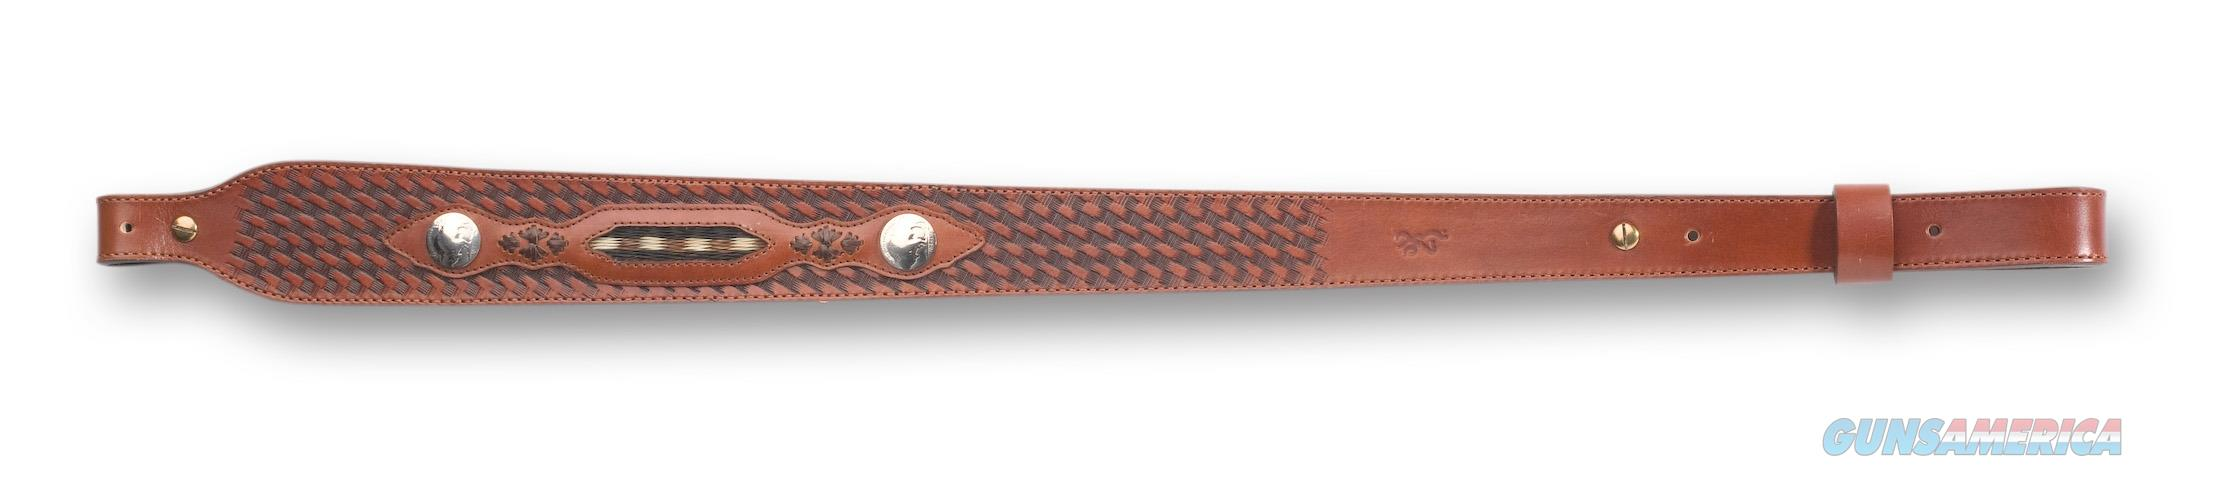 Browning Buffalo Nickel LEATHER SLING  New!  122602  Non-Guns > Gun Parts > Misc > Rifles